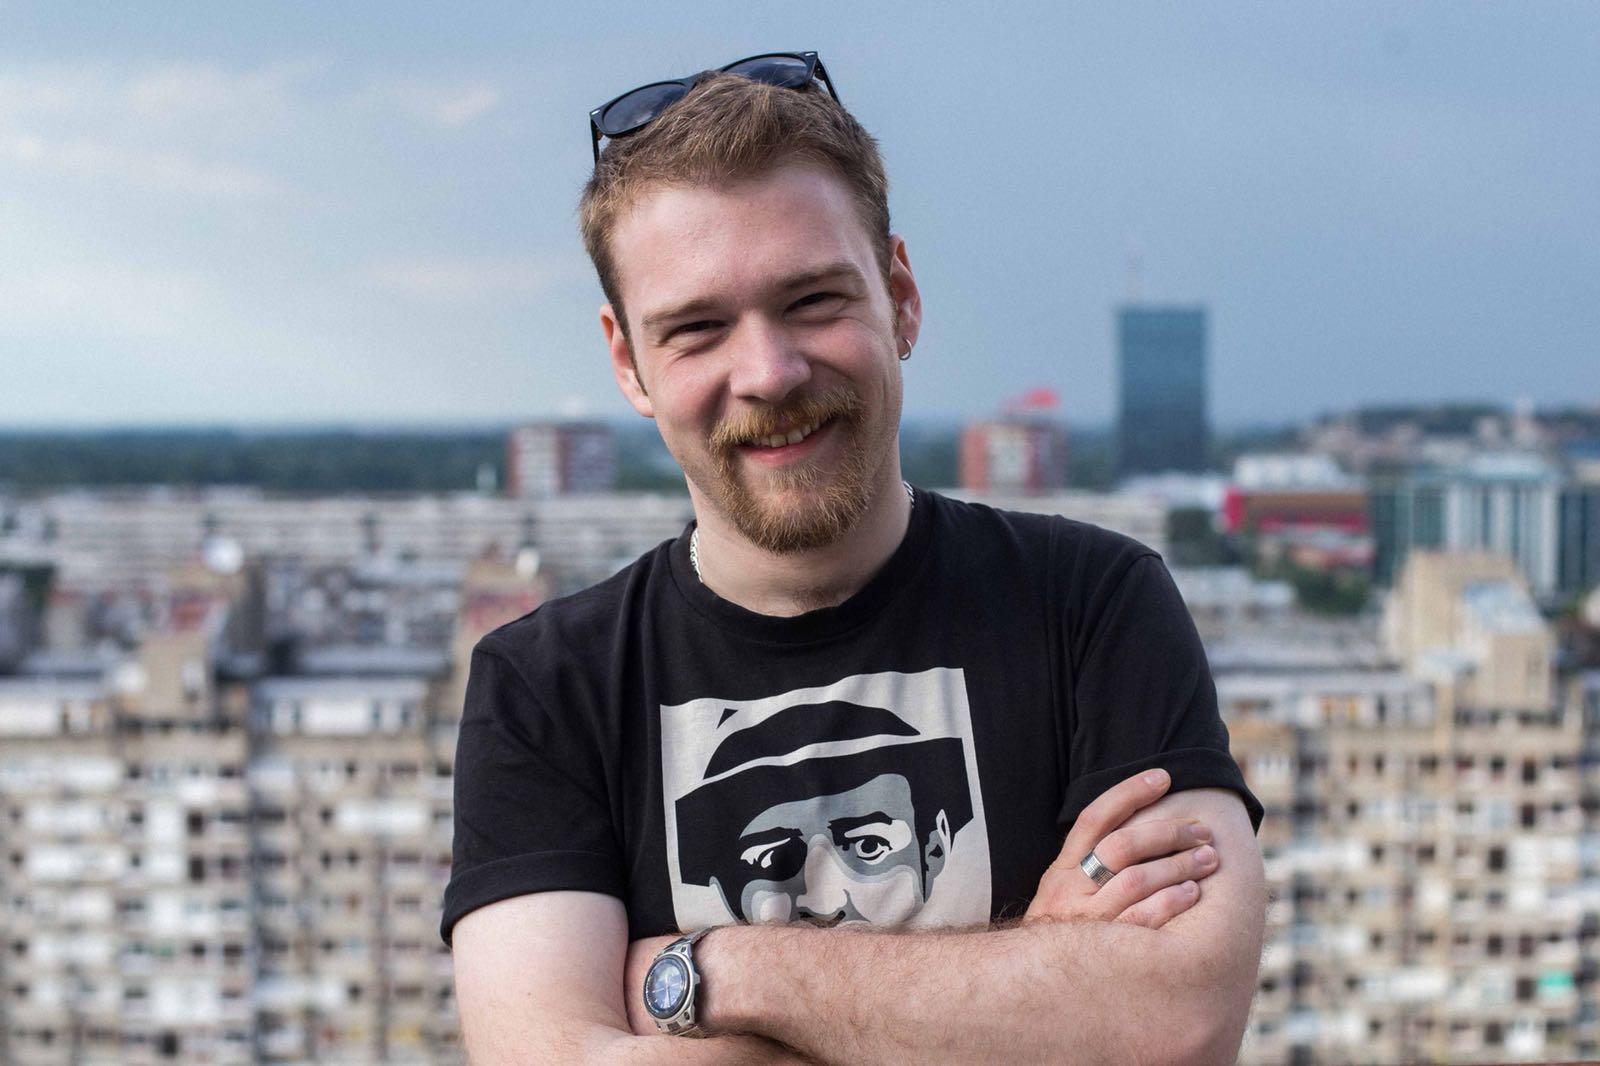 Filip Kostadinović